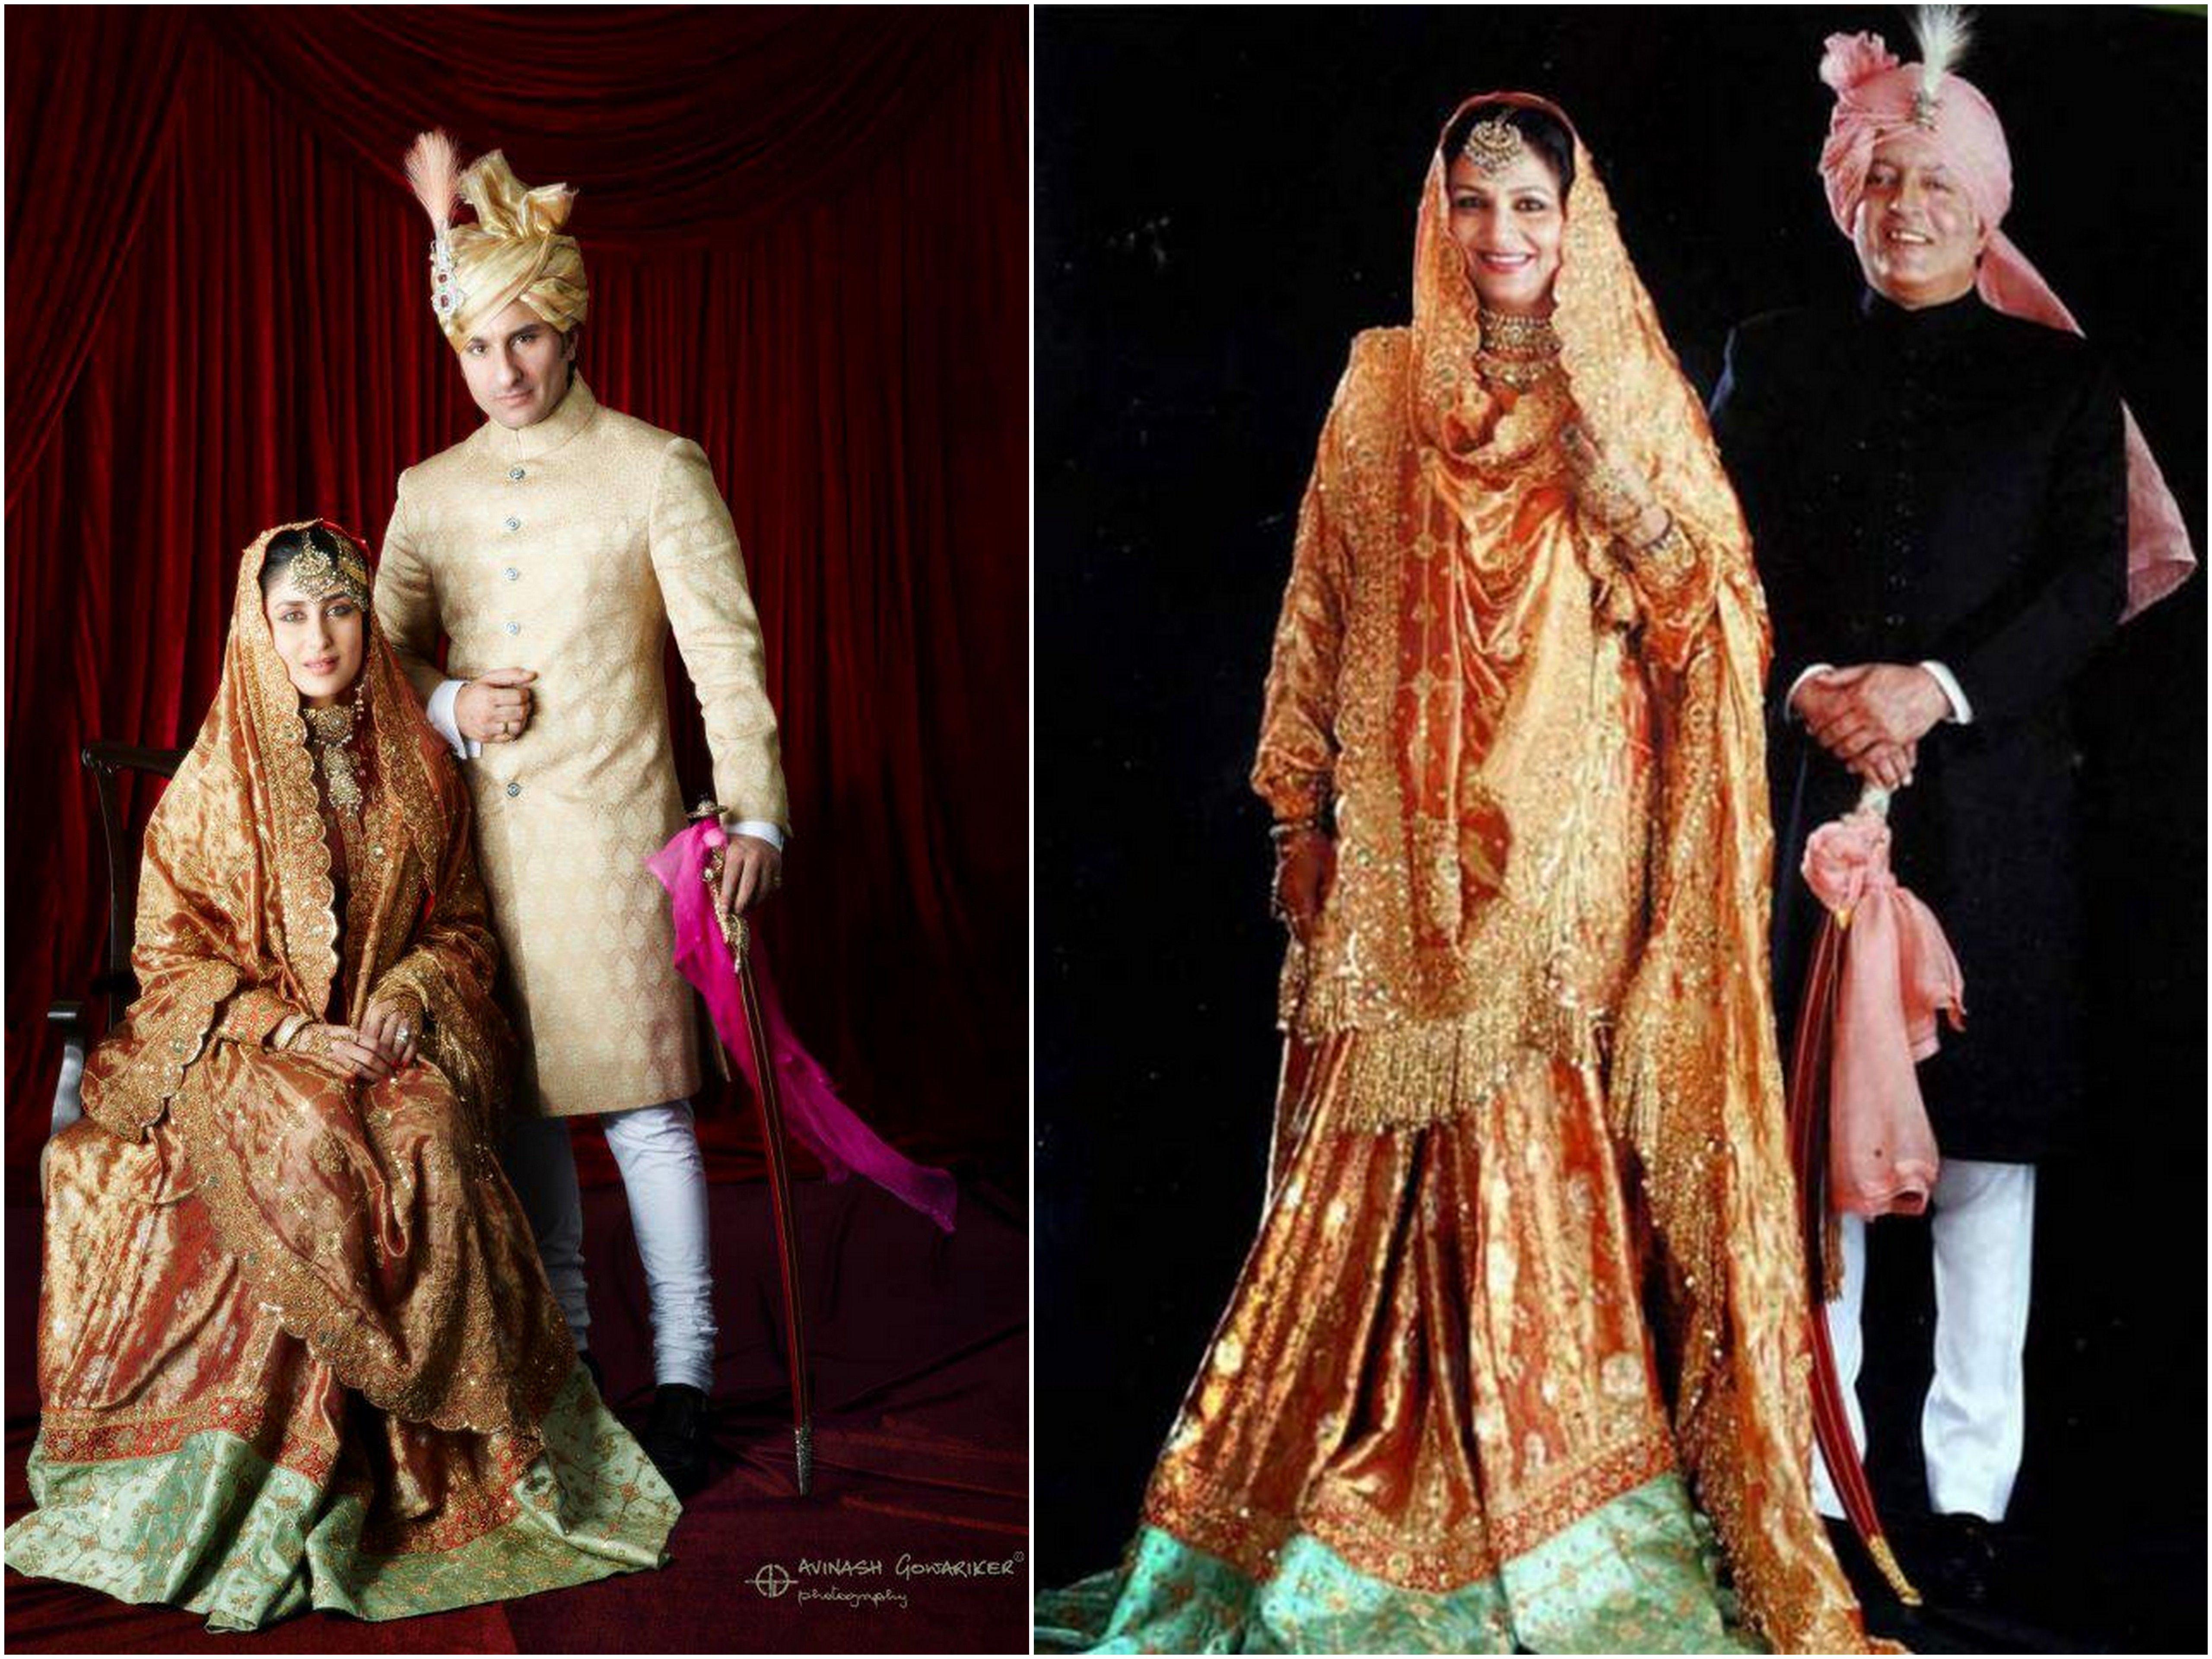 Kareena Kapoor Wedding Archives Indian Wedding Site Kareena Kapoor Wedding Indian Wedding Fashion Kareena Kapoor Wedding Dress